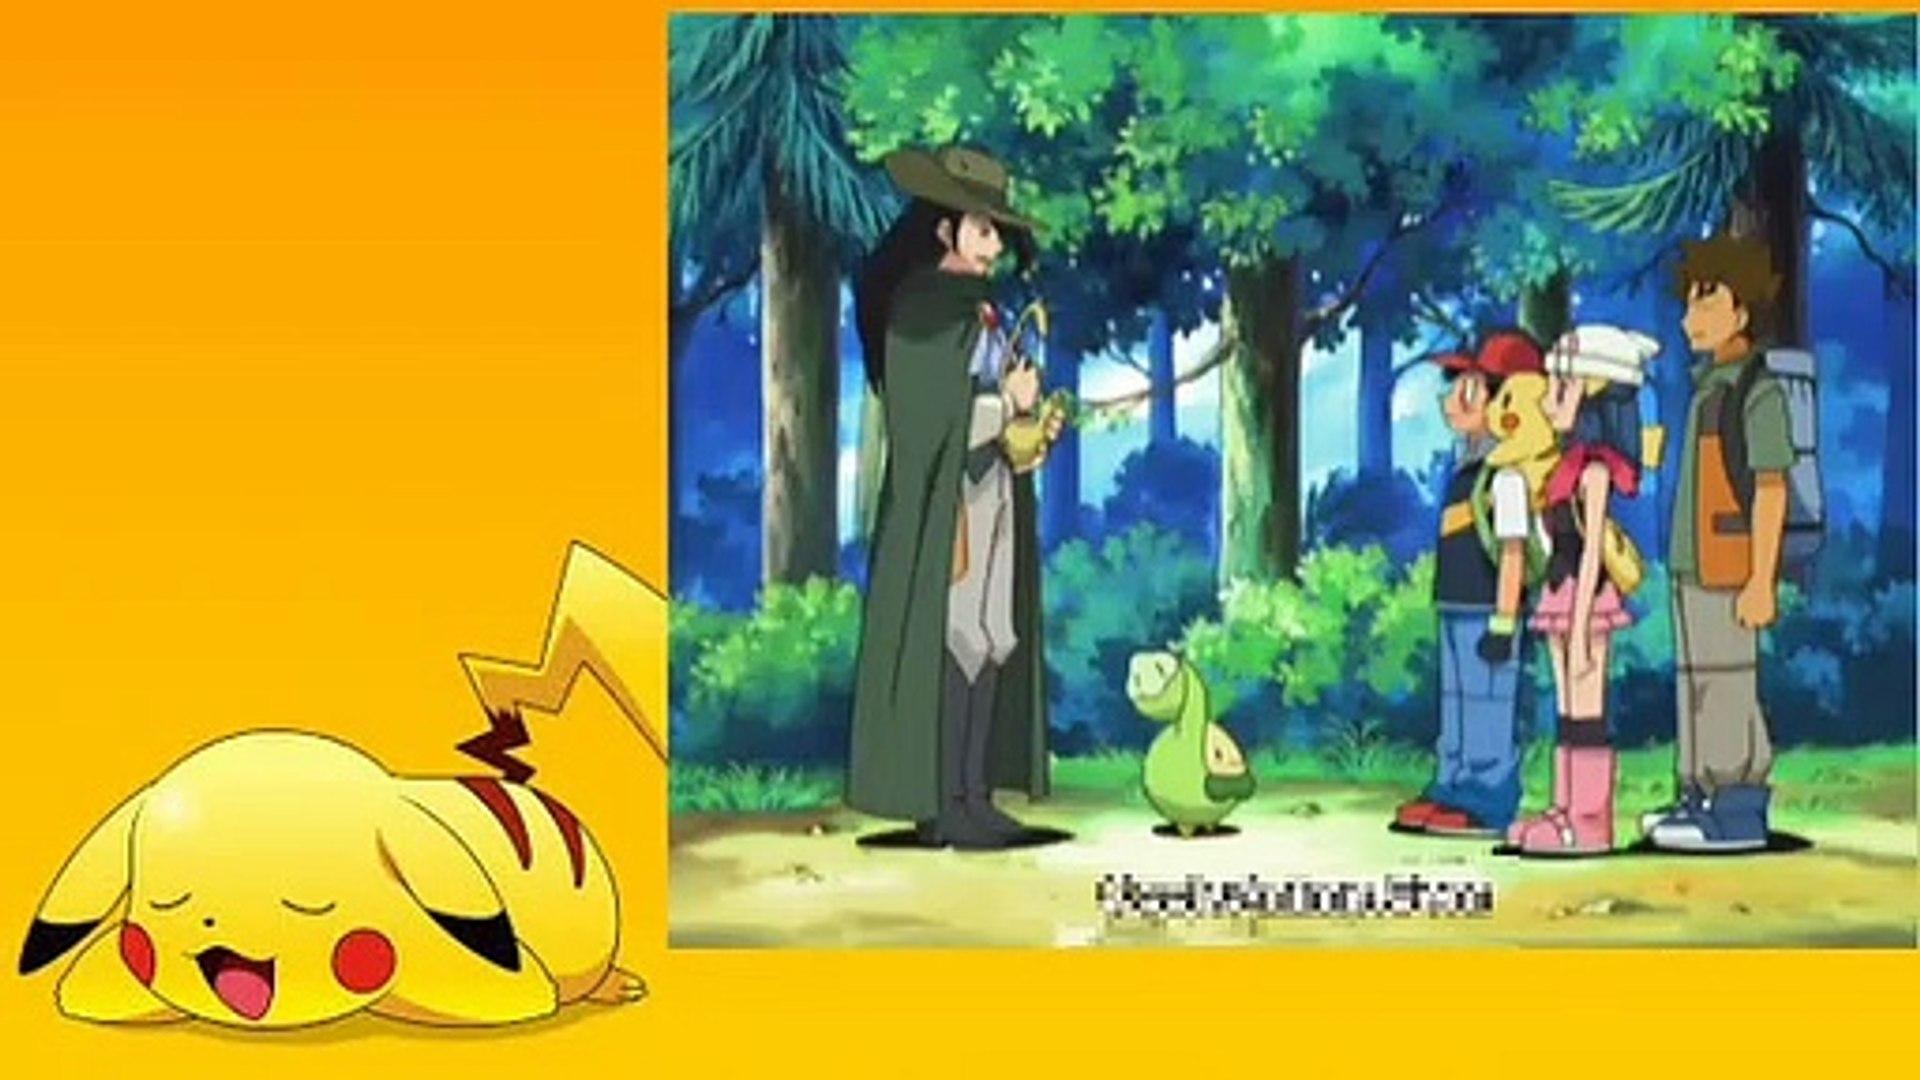 Pokemon diamond and pearl episode 4 in Hindi || Pokemon generation 4  episode 4